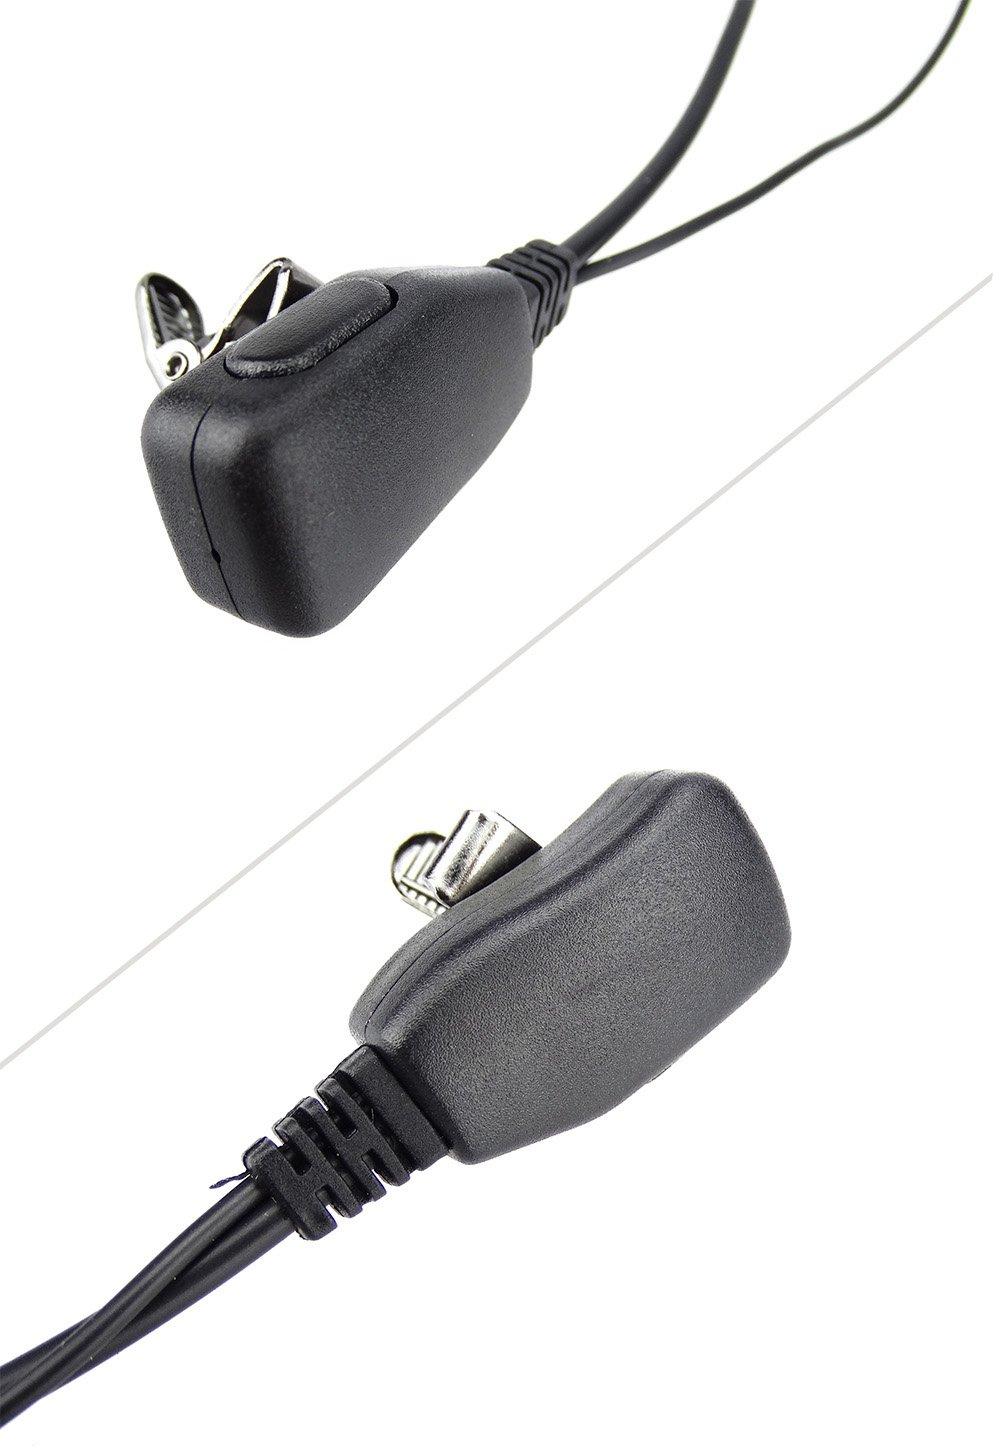 XFox 2Pin Advanced D Shape Clip-Ear PTT Headset Earpiece Mic for Motorola 2 Way Radios GP88S GP300 GP68 GP2000 GP88 GP3188 CP040 CP1200 A8 A6 A10 A12 Walkie Talkies(2Pack) by XFOX (Image #6)